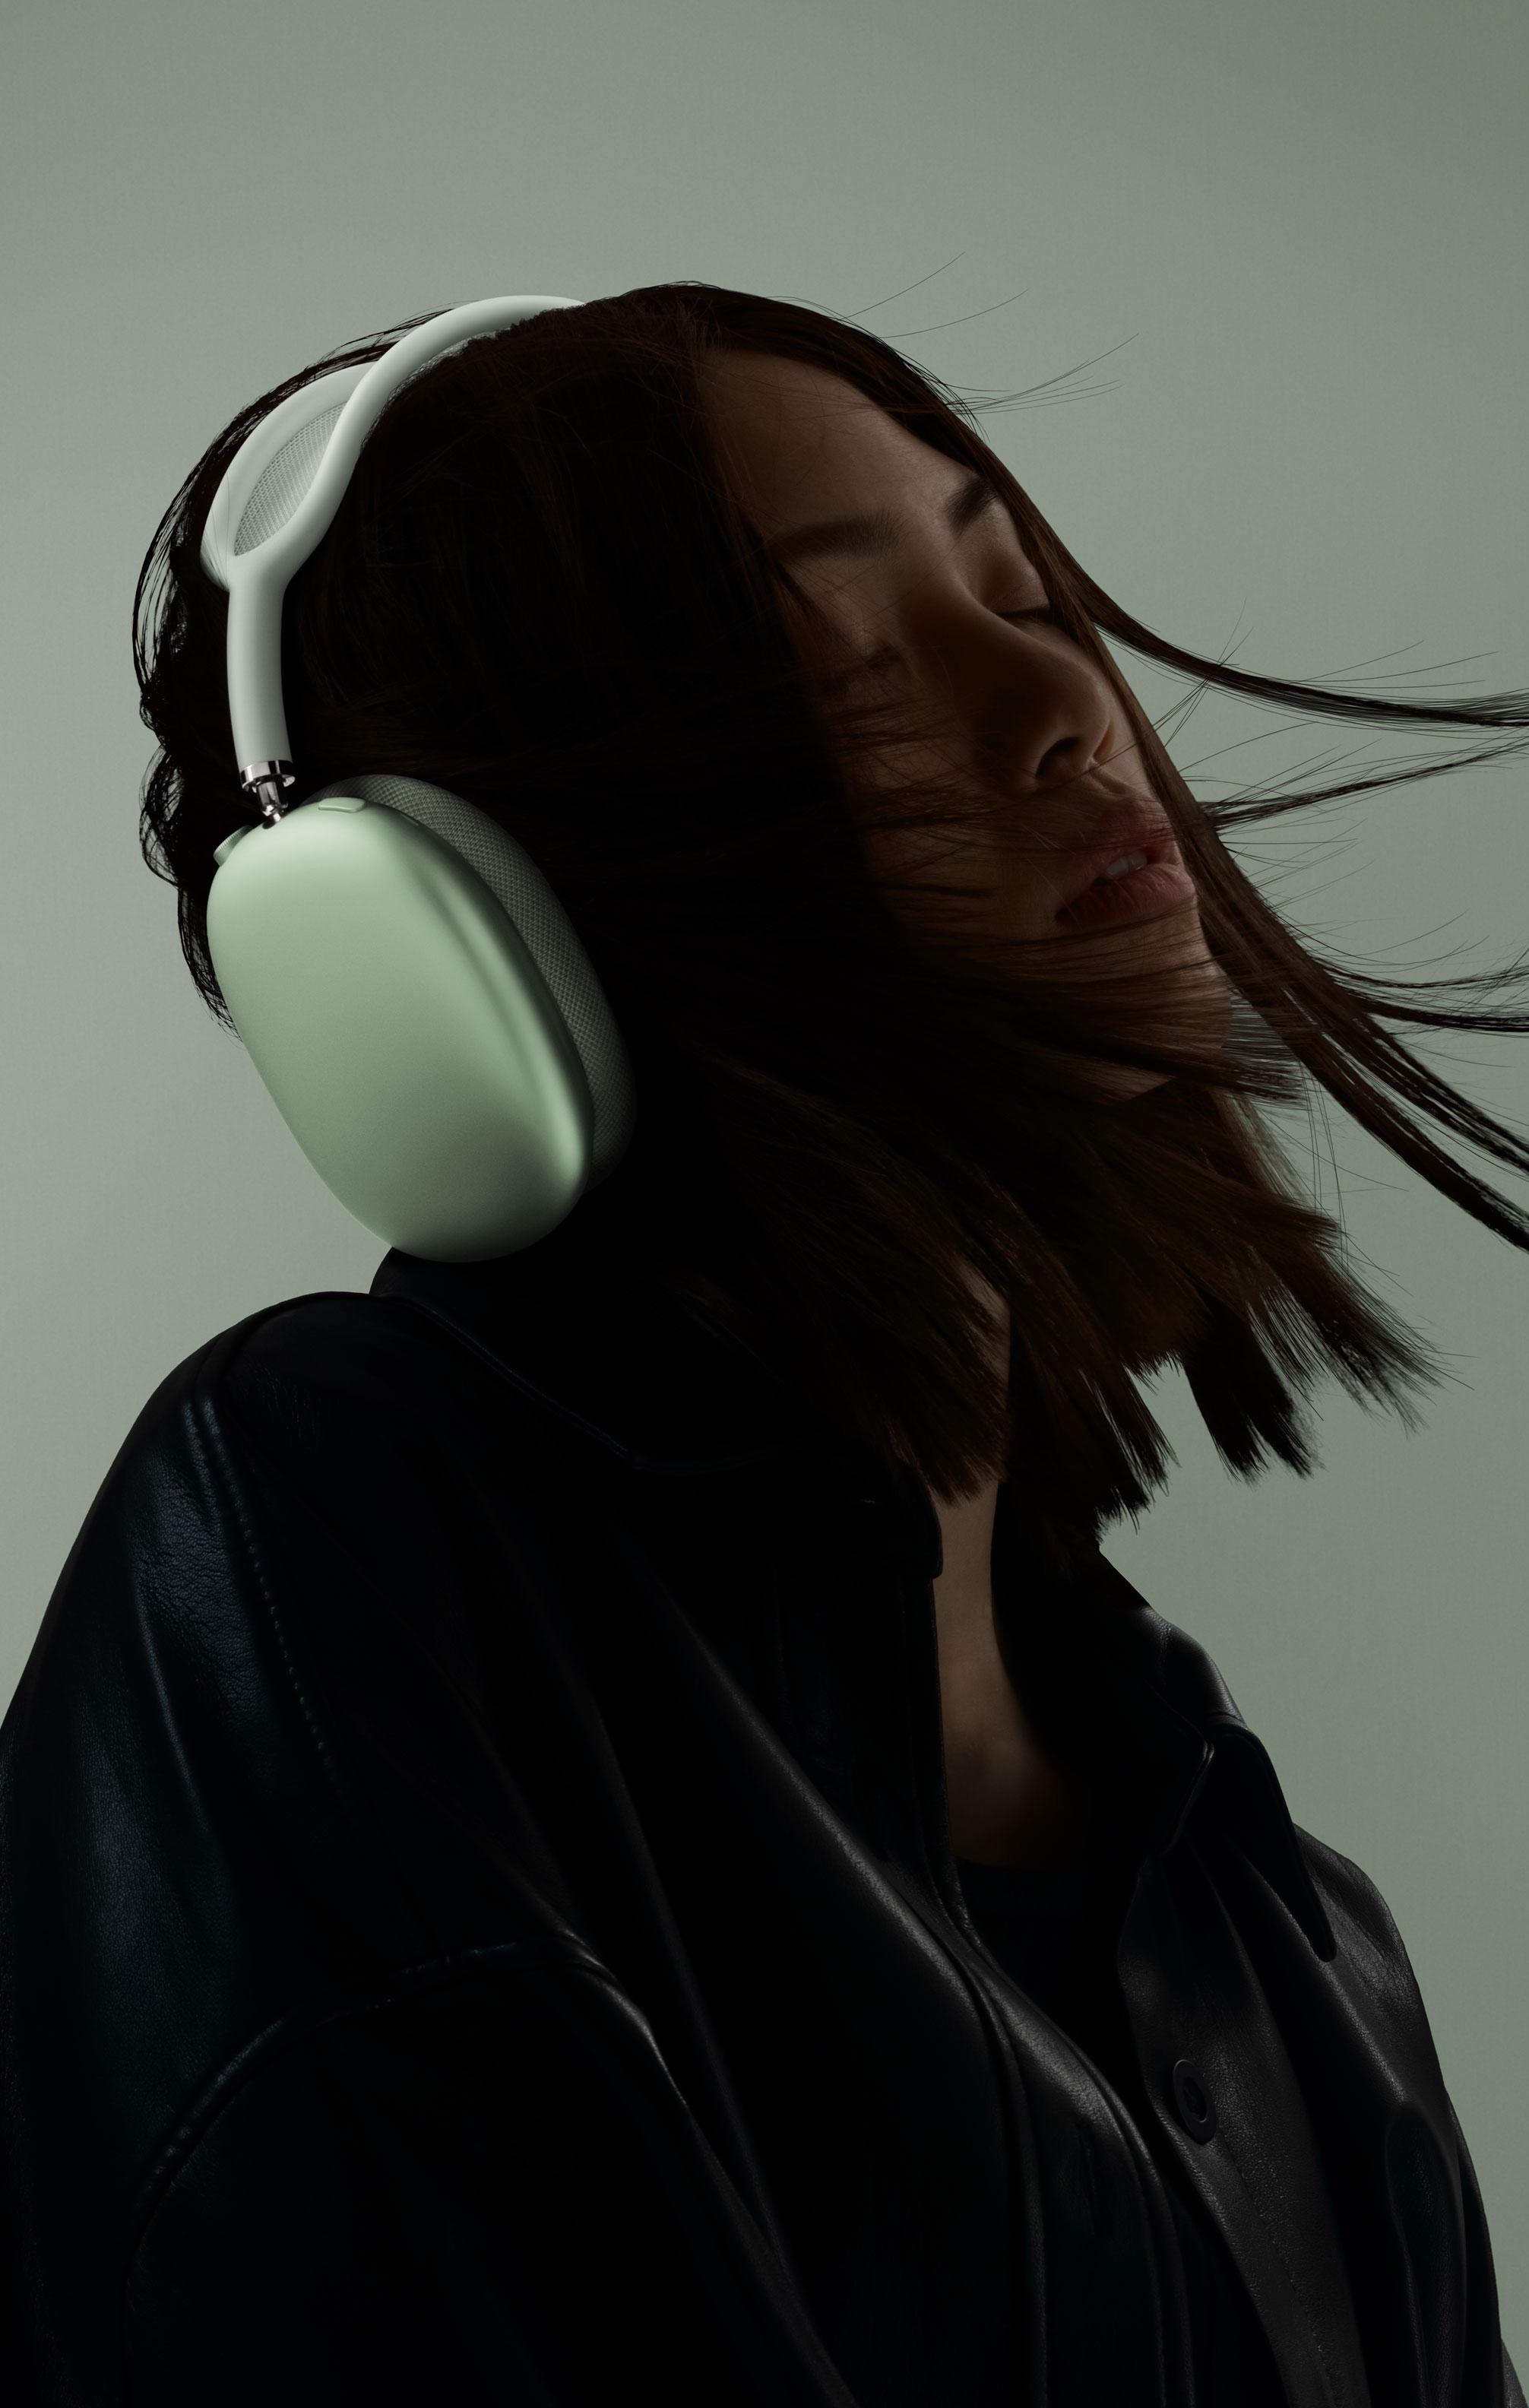 audio_quality_eq__bw20hke6z1ea_xlarge_2x